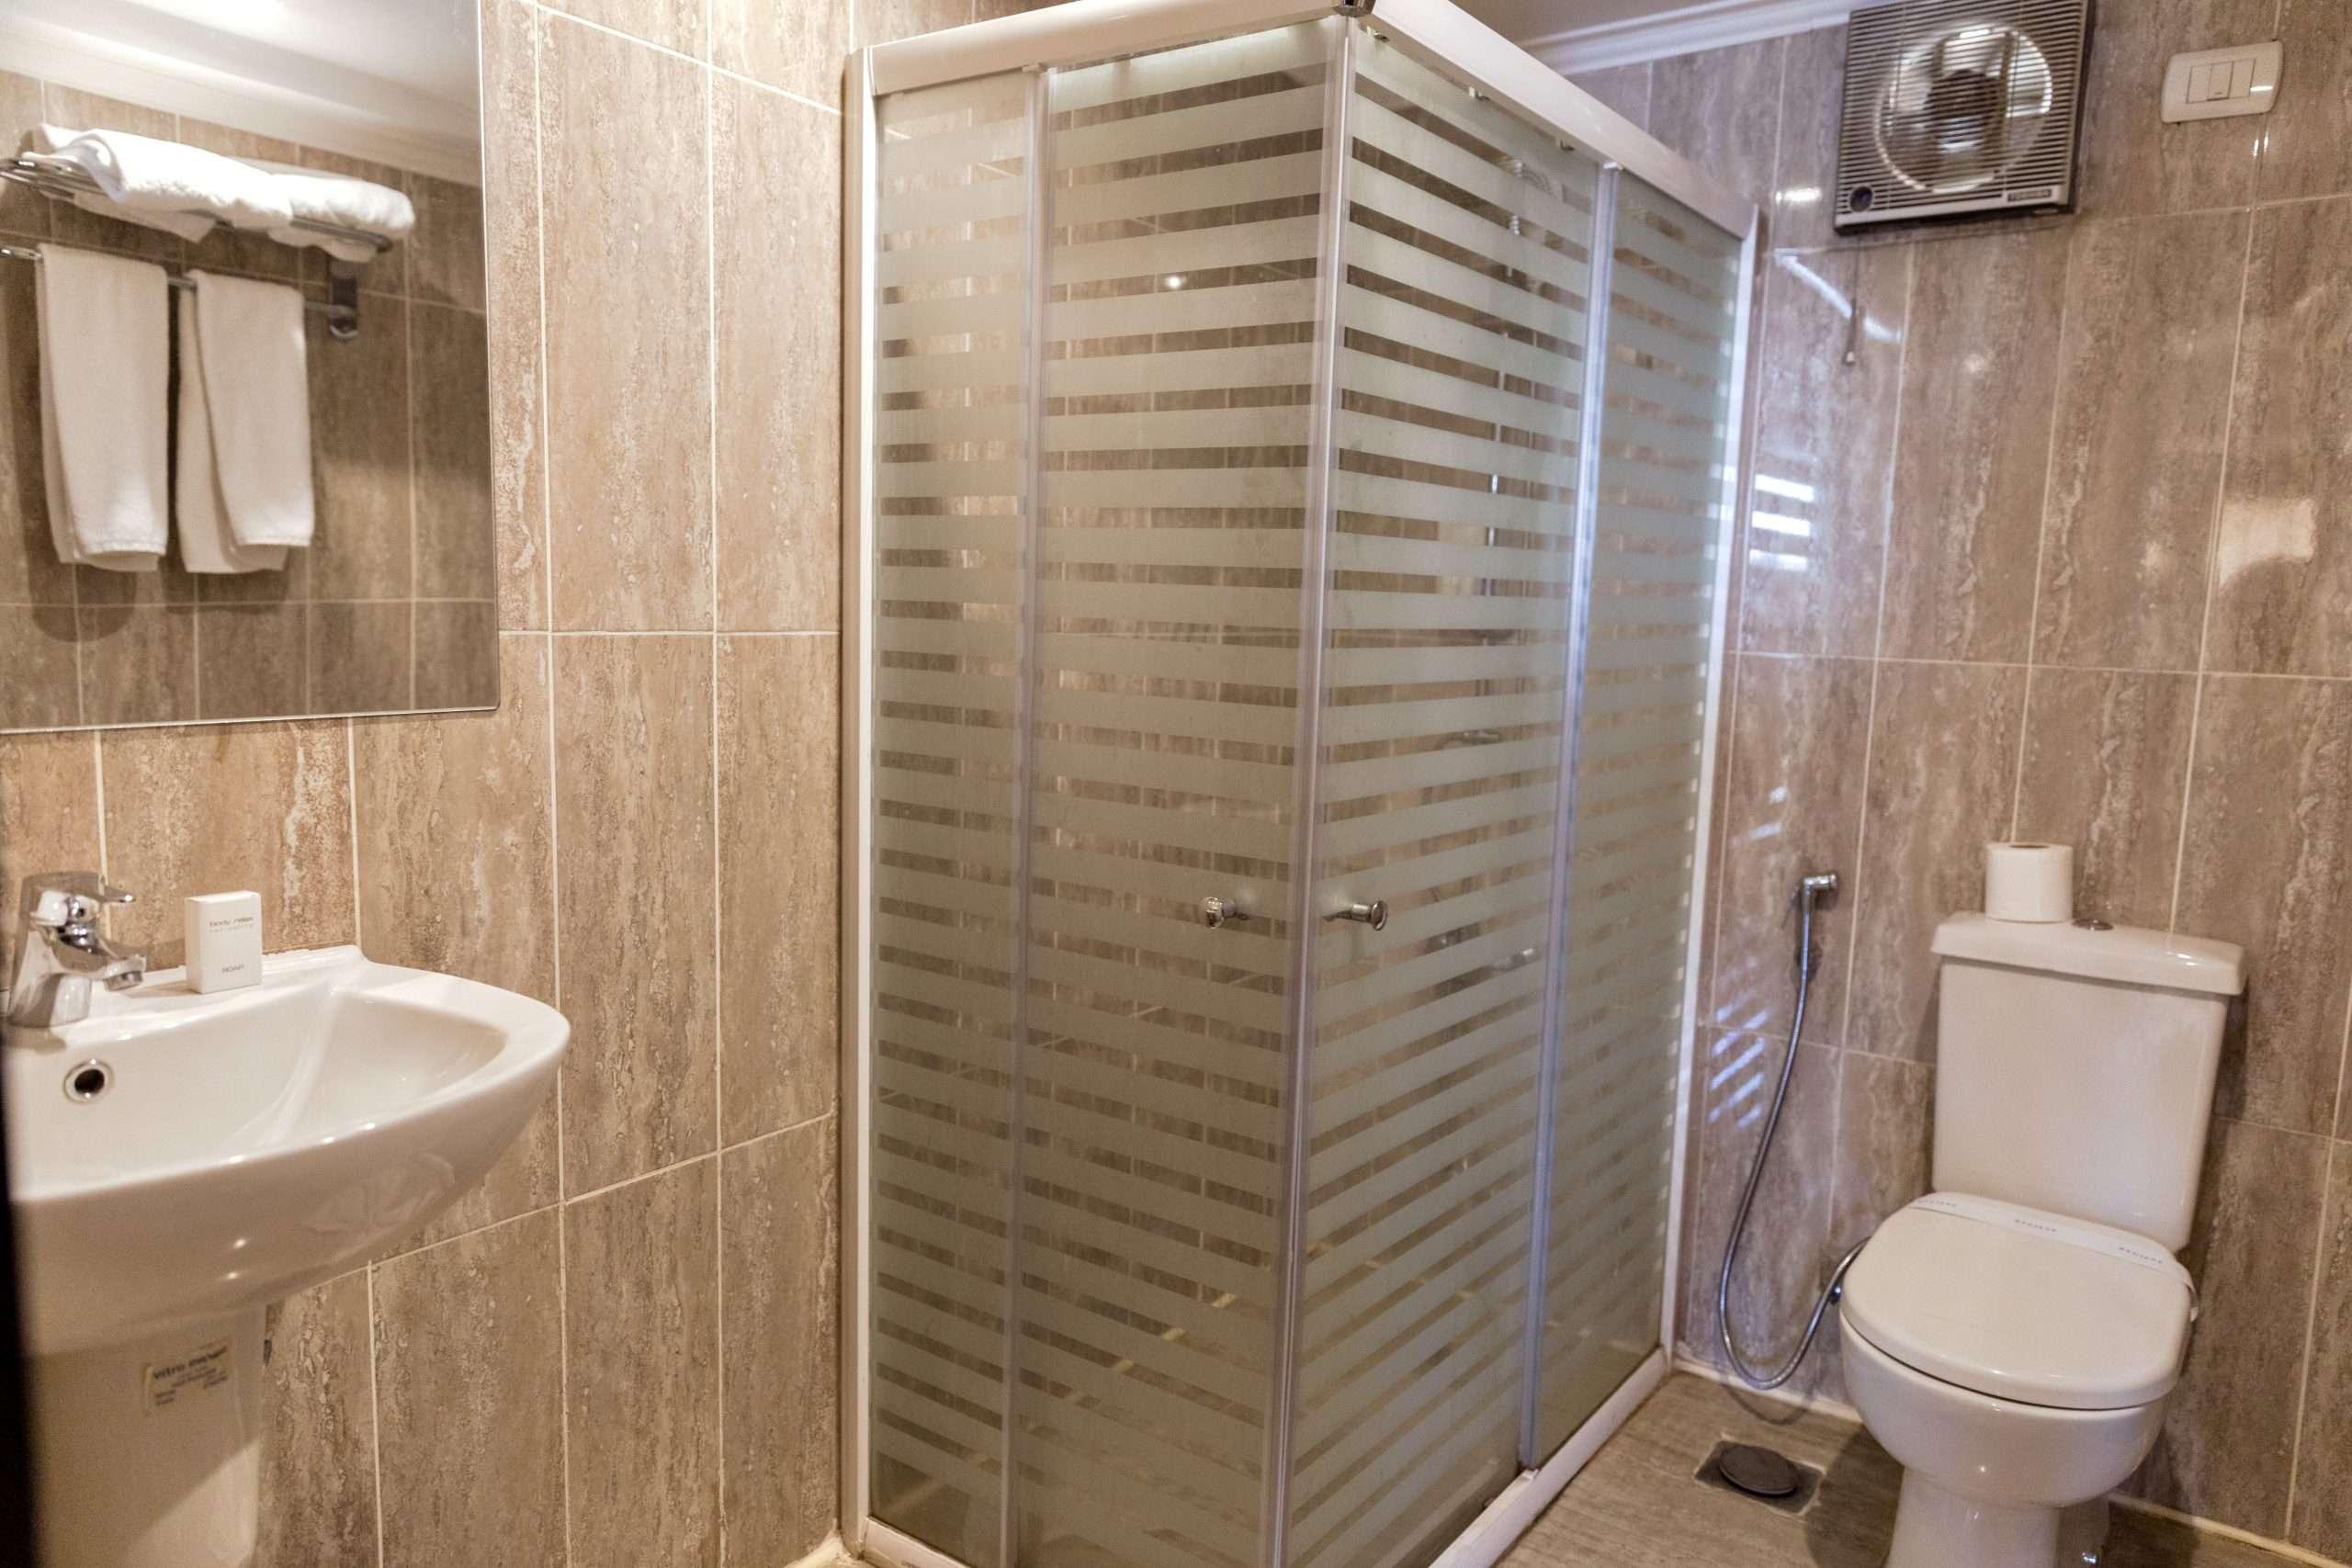 Shower and bathroom in the obelisk nile hotel in Aswan